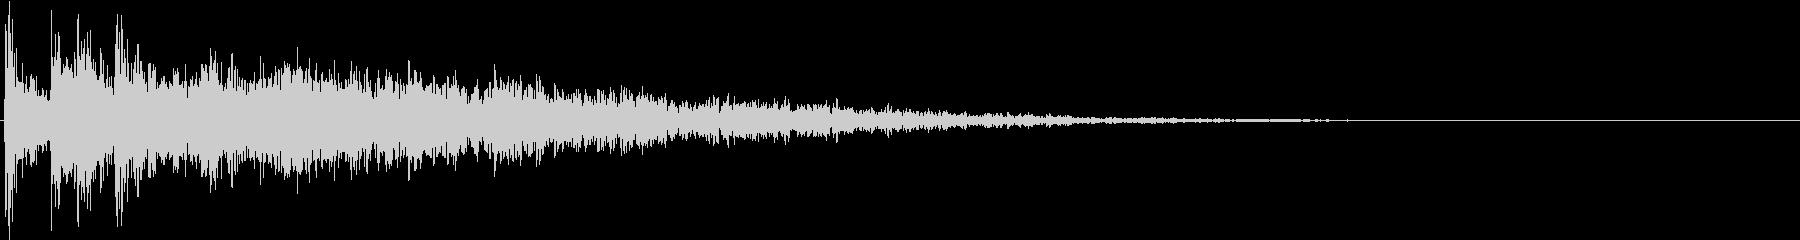 CINEMATIC FX_物音の未再生の波形